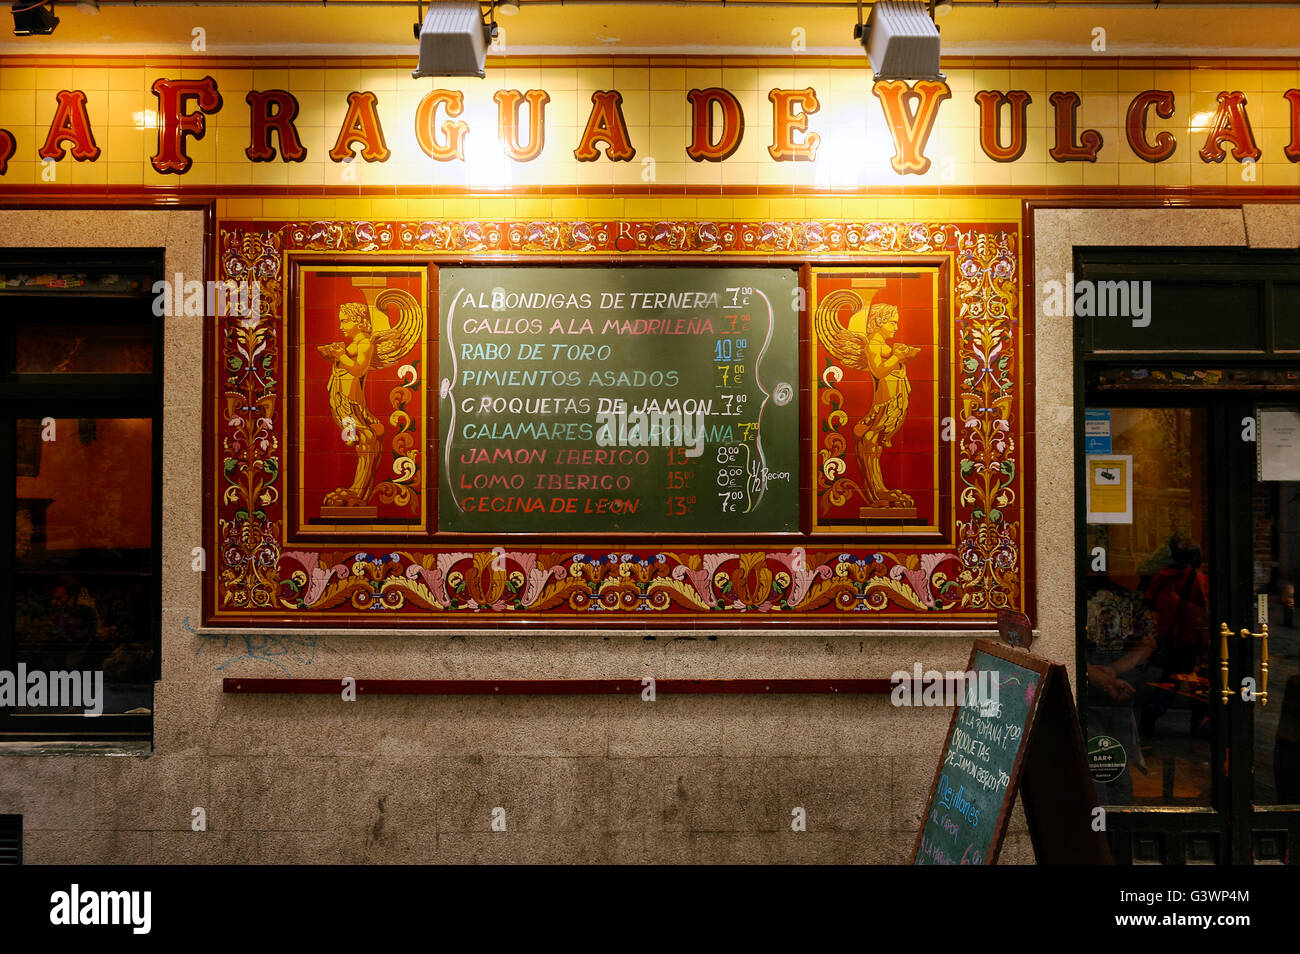 Fragua Stock Photos & Fragua Stock Images - Alamy